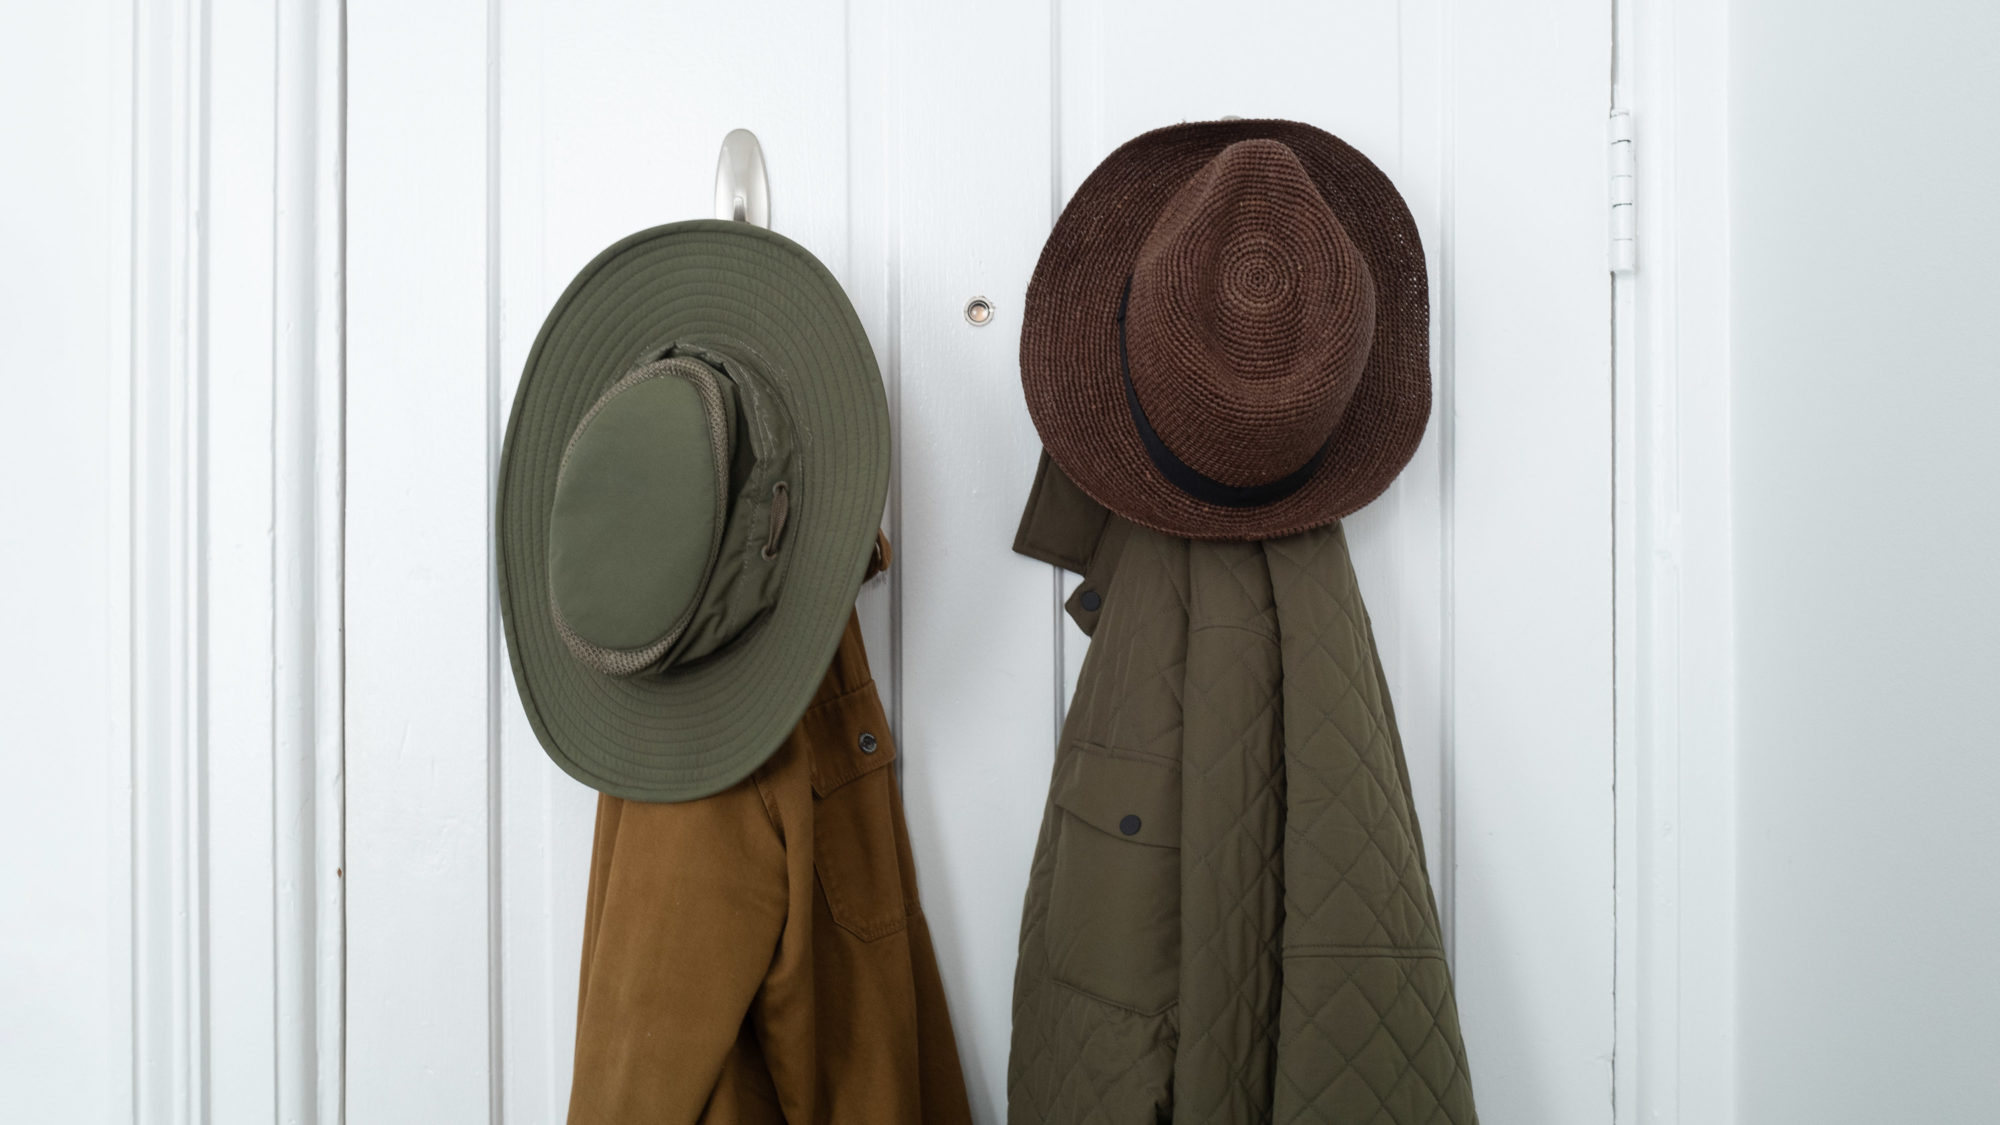 green hat, brown jacket, brown hat, green jacket